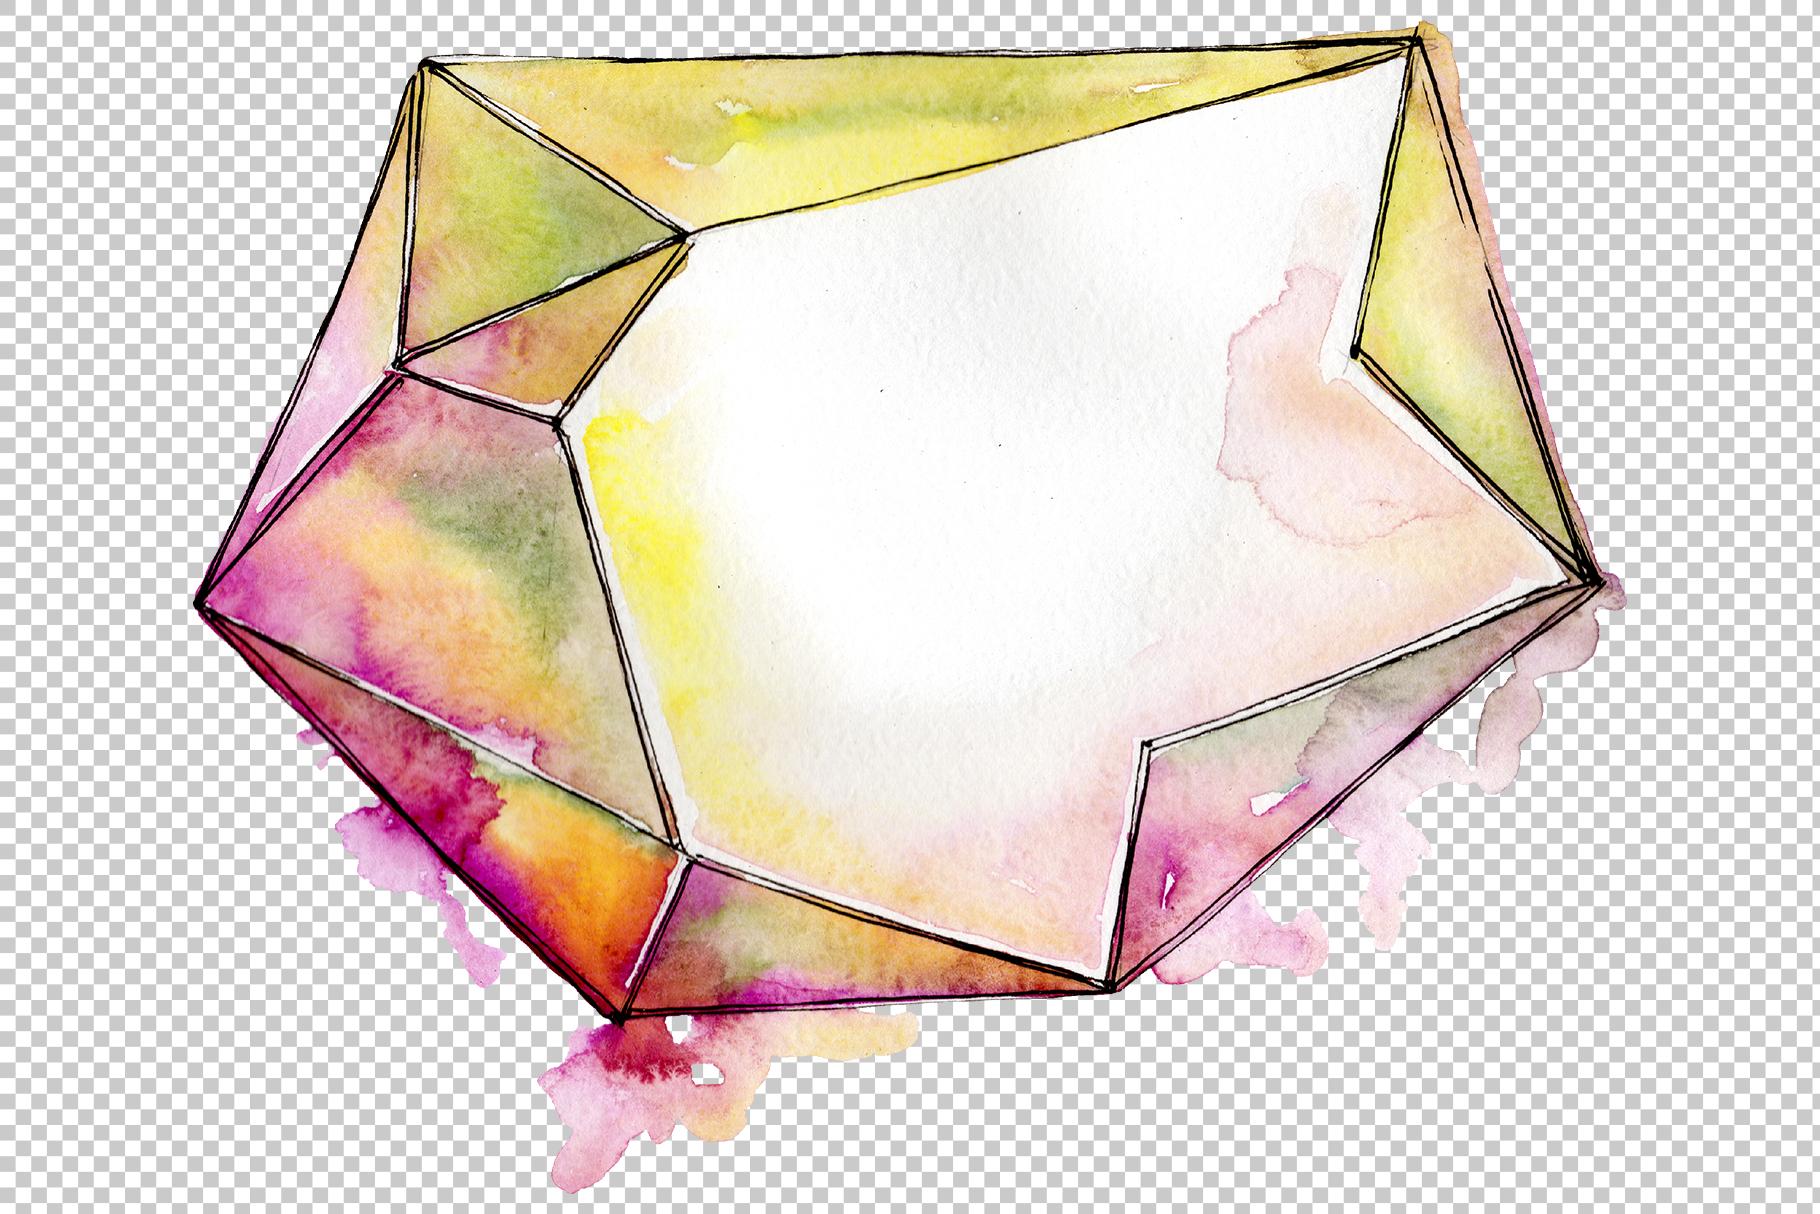 Aquamarine crystals Watercolor png example image 2